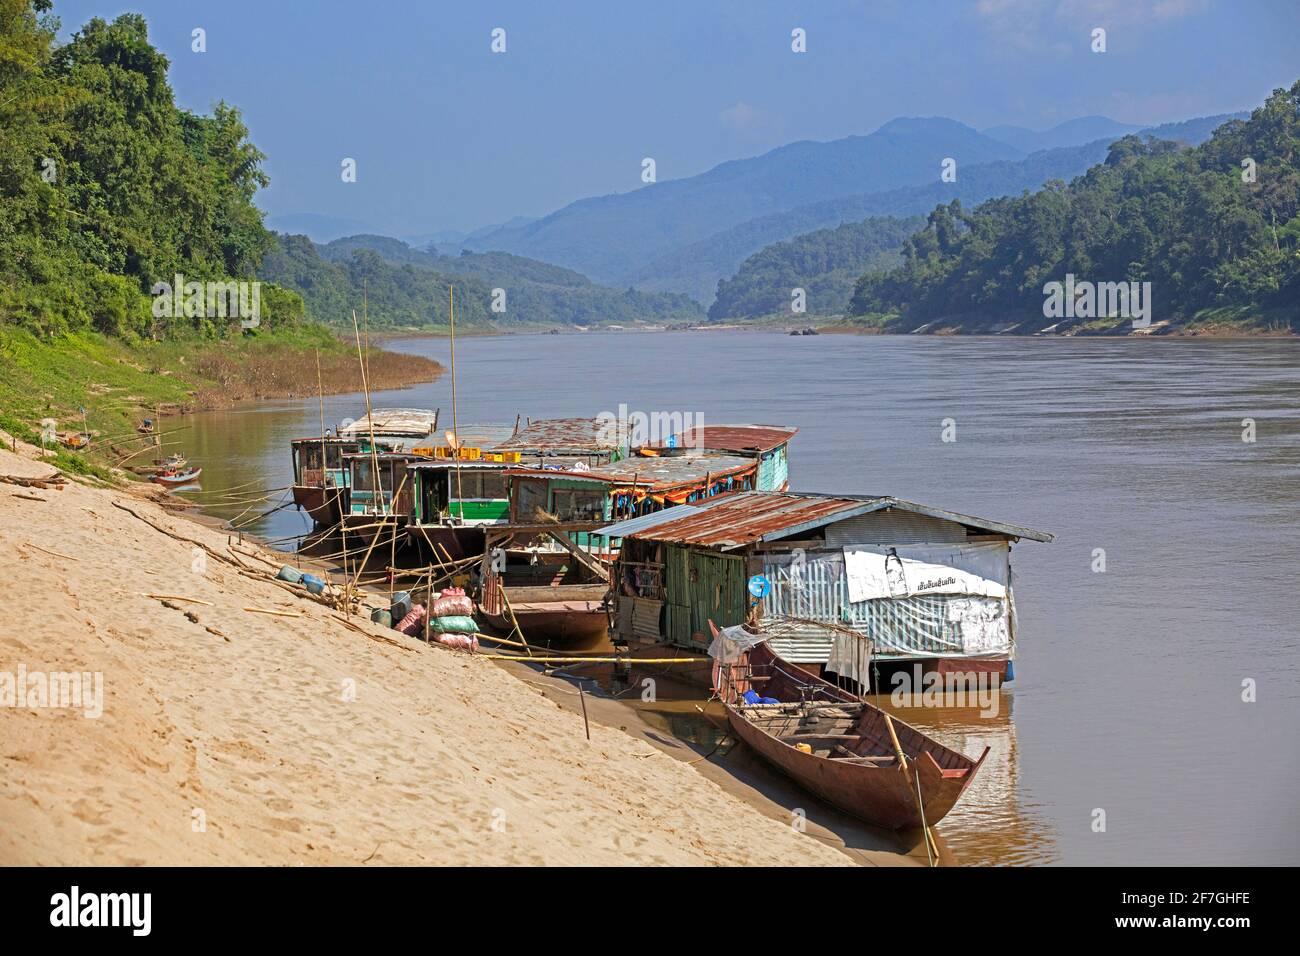 Slowboats / botes lentos para cruceros por el río a Luang Phabang / Luang Prabang / Louangphabang en el río Mekong al atardecer, Laos Foto de stock